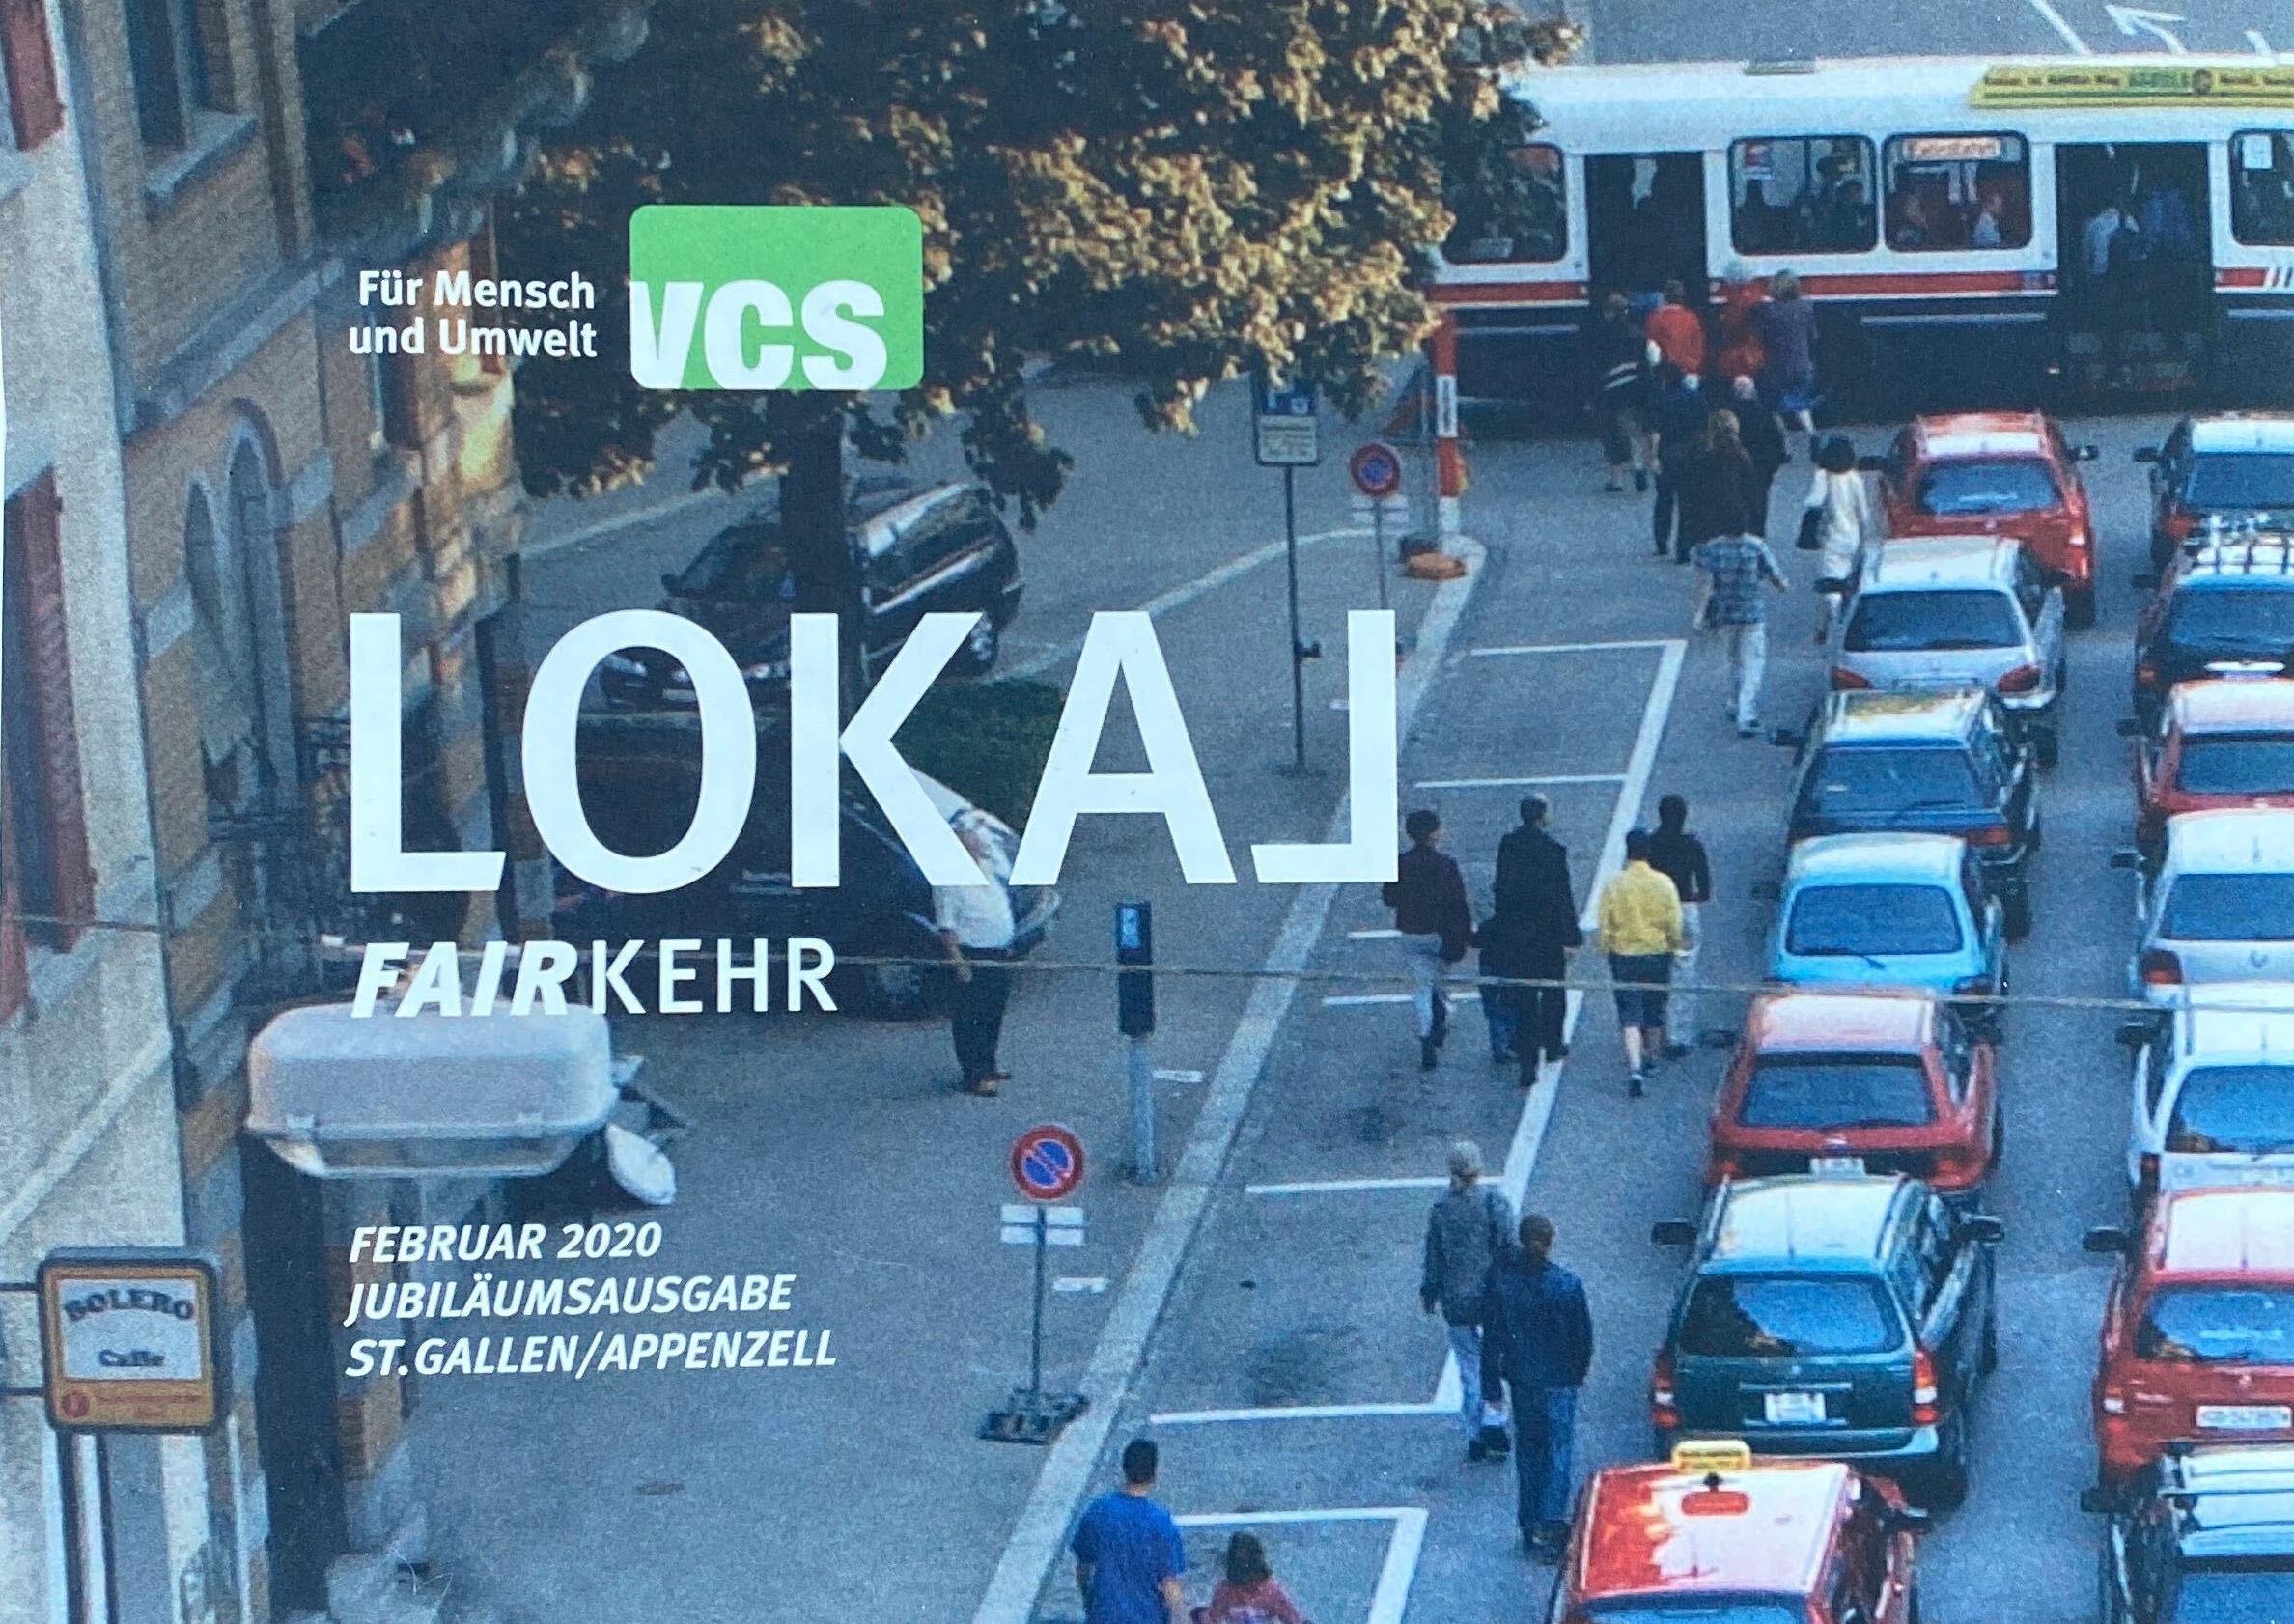 Vcs_lokal